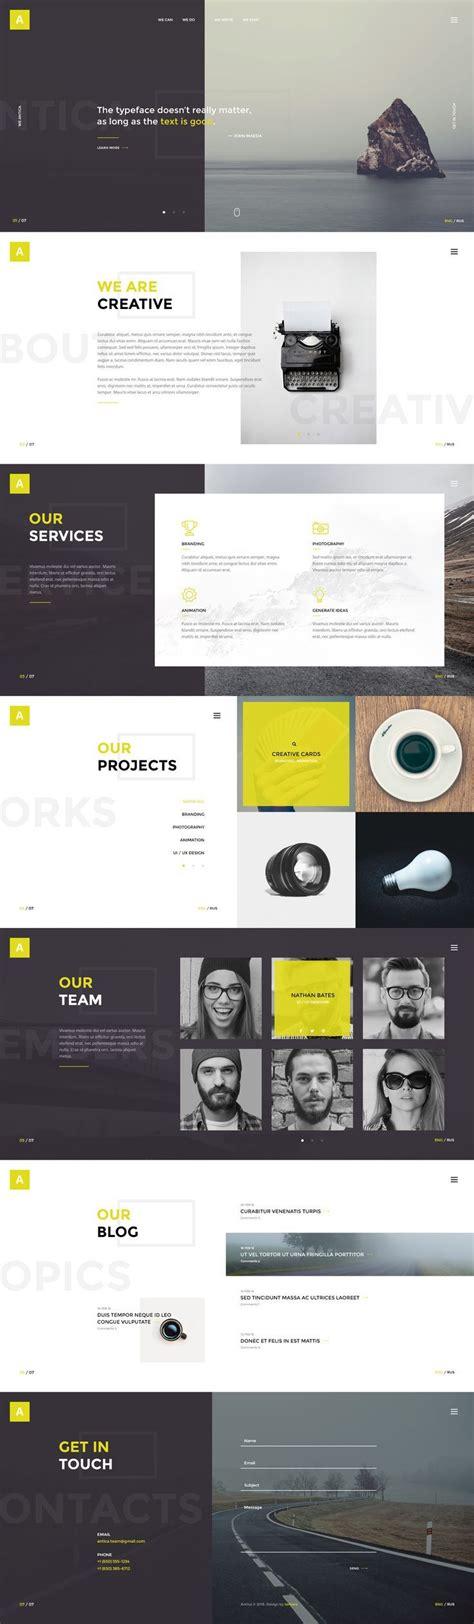 Best 25 Web Design Ideas On Pinterest Website Design Inspiration Web Design Programs And Web Web Agency Template